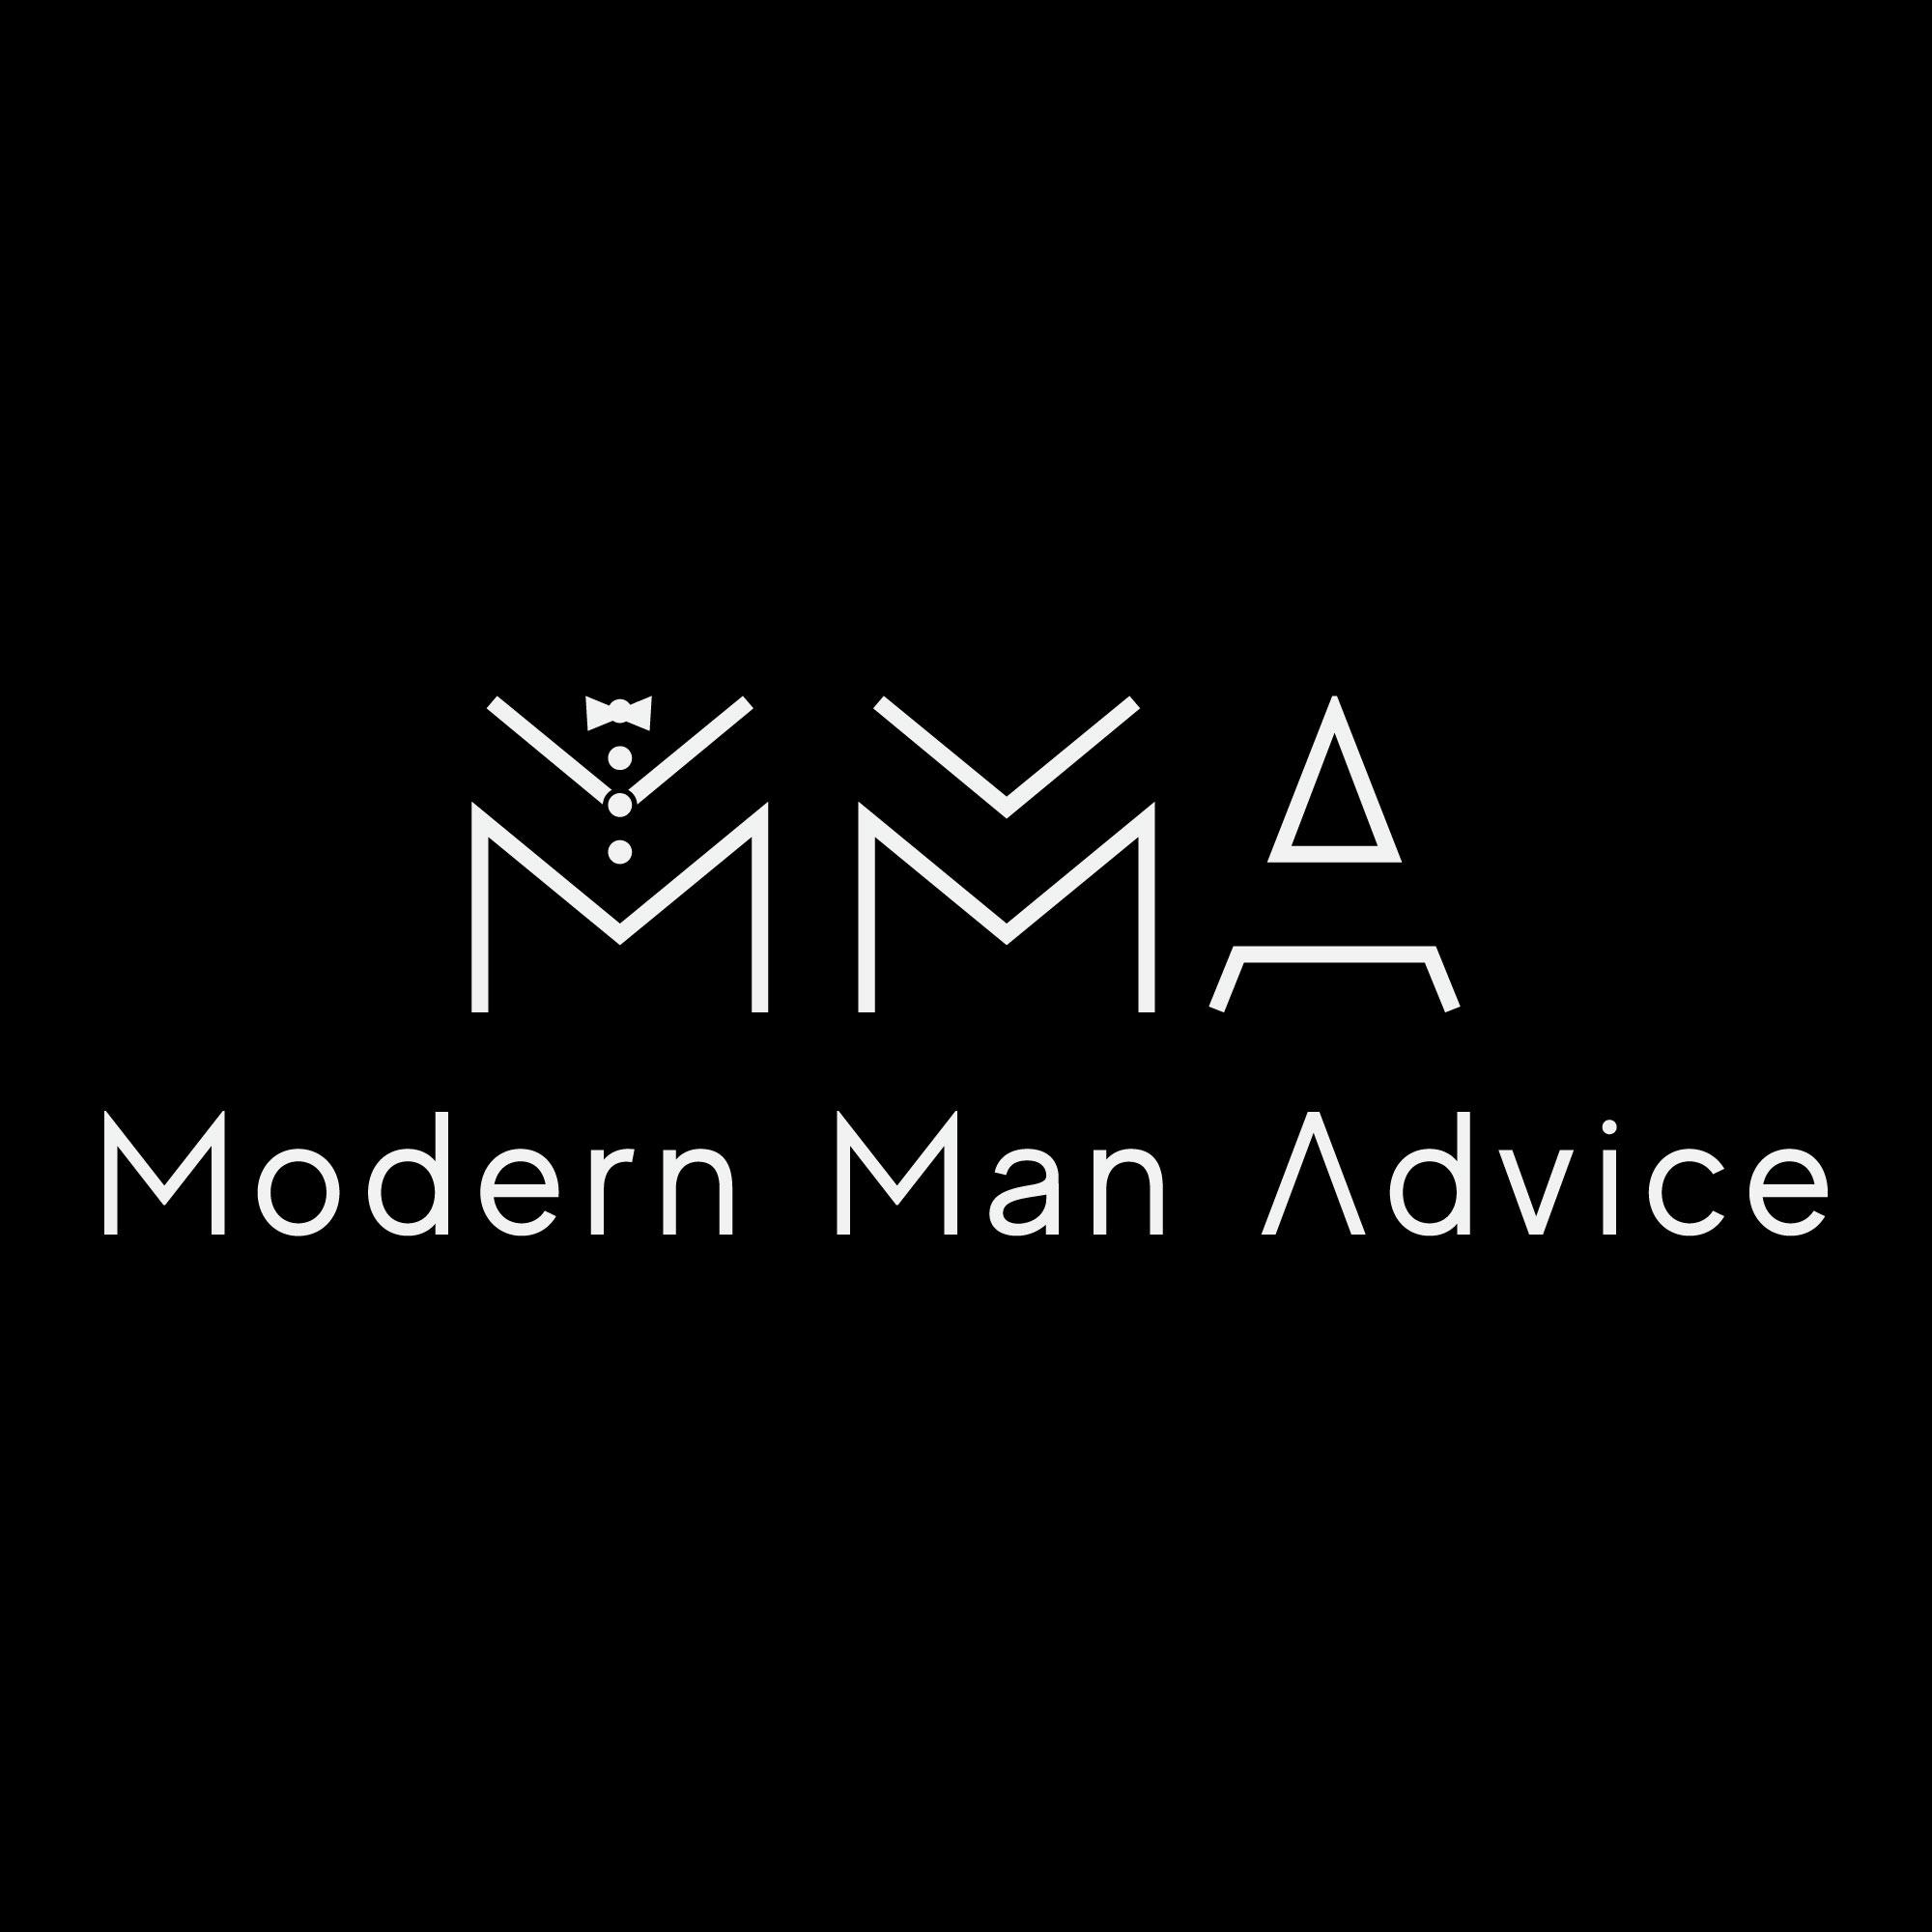 Modern-Man-Advice